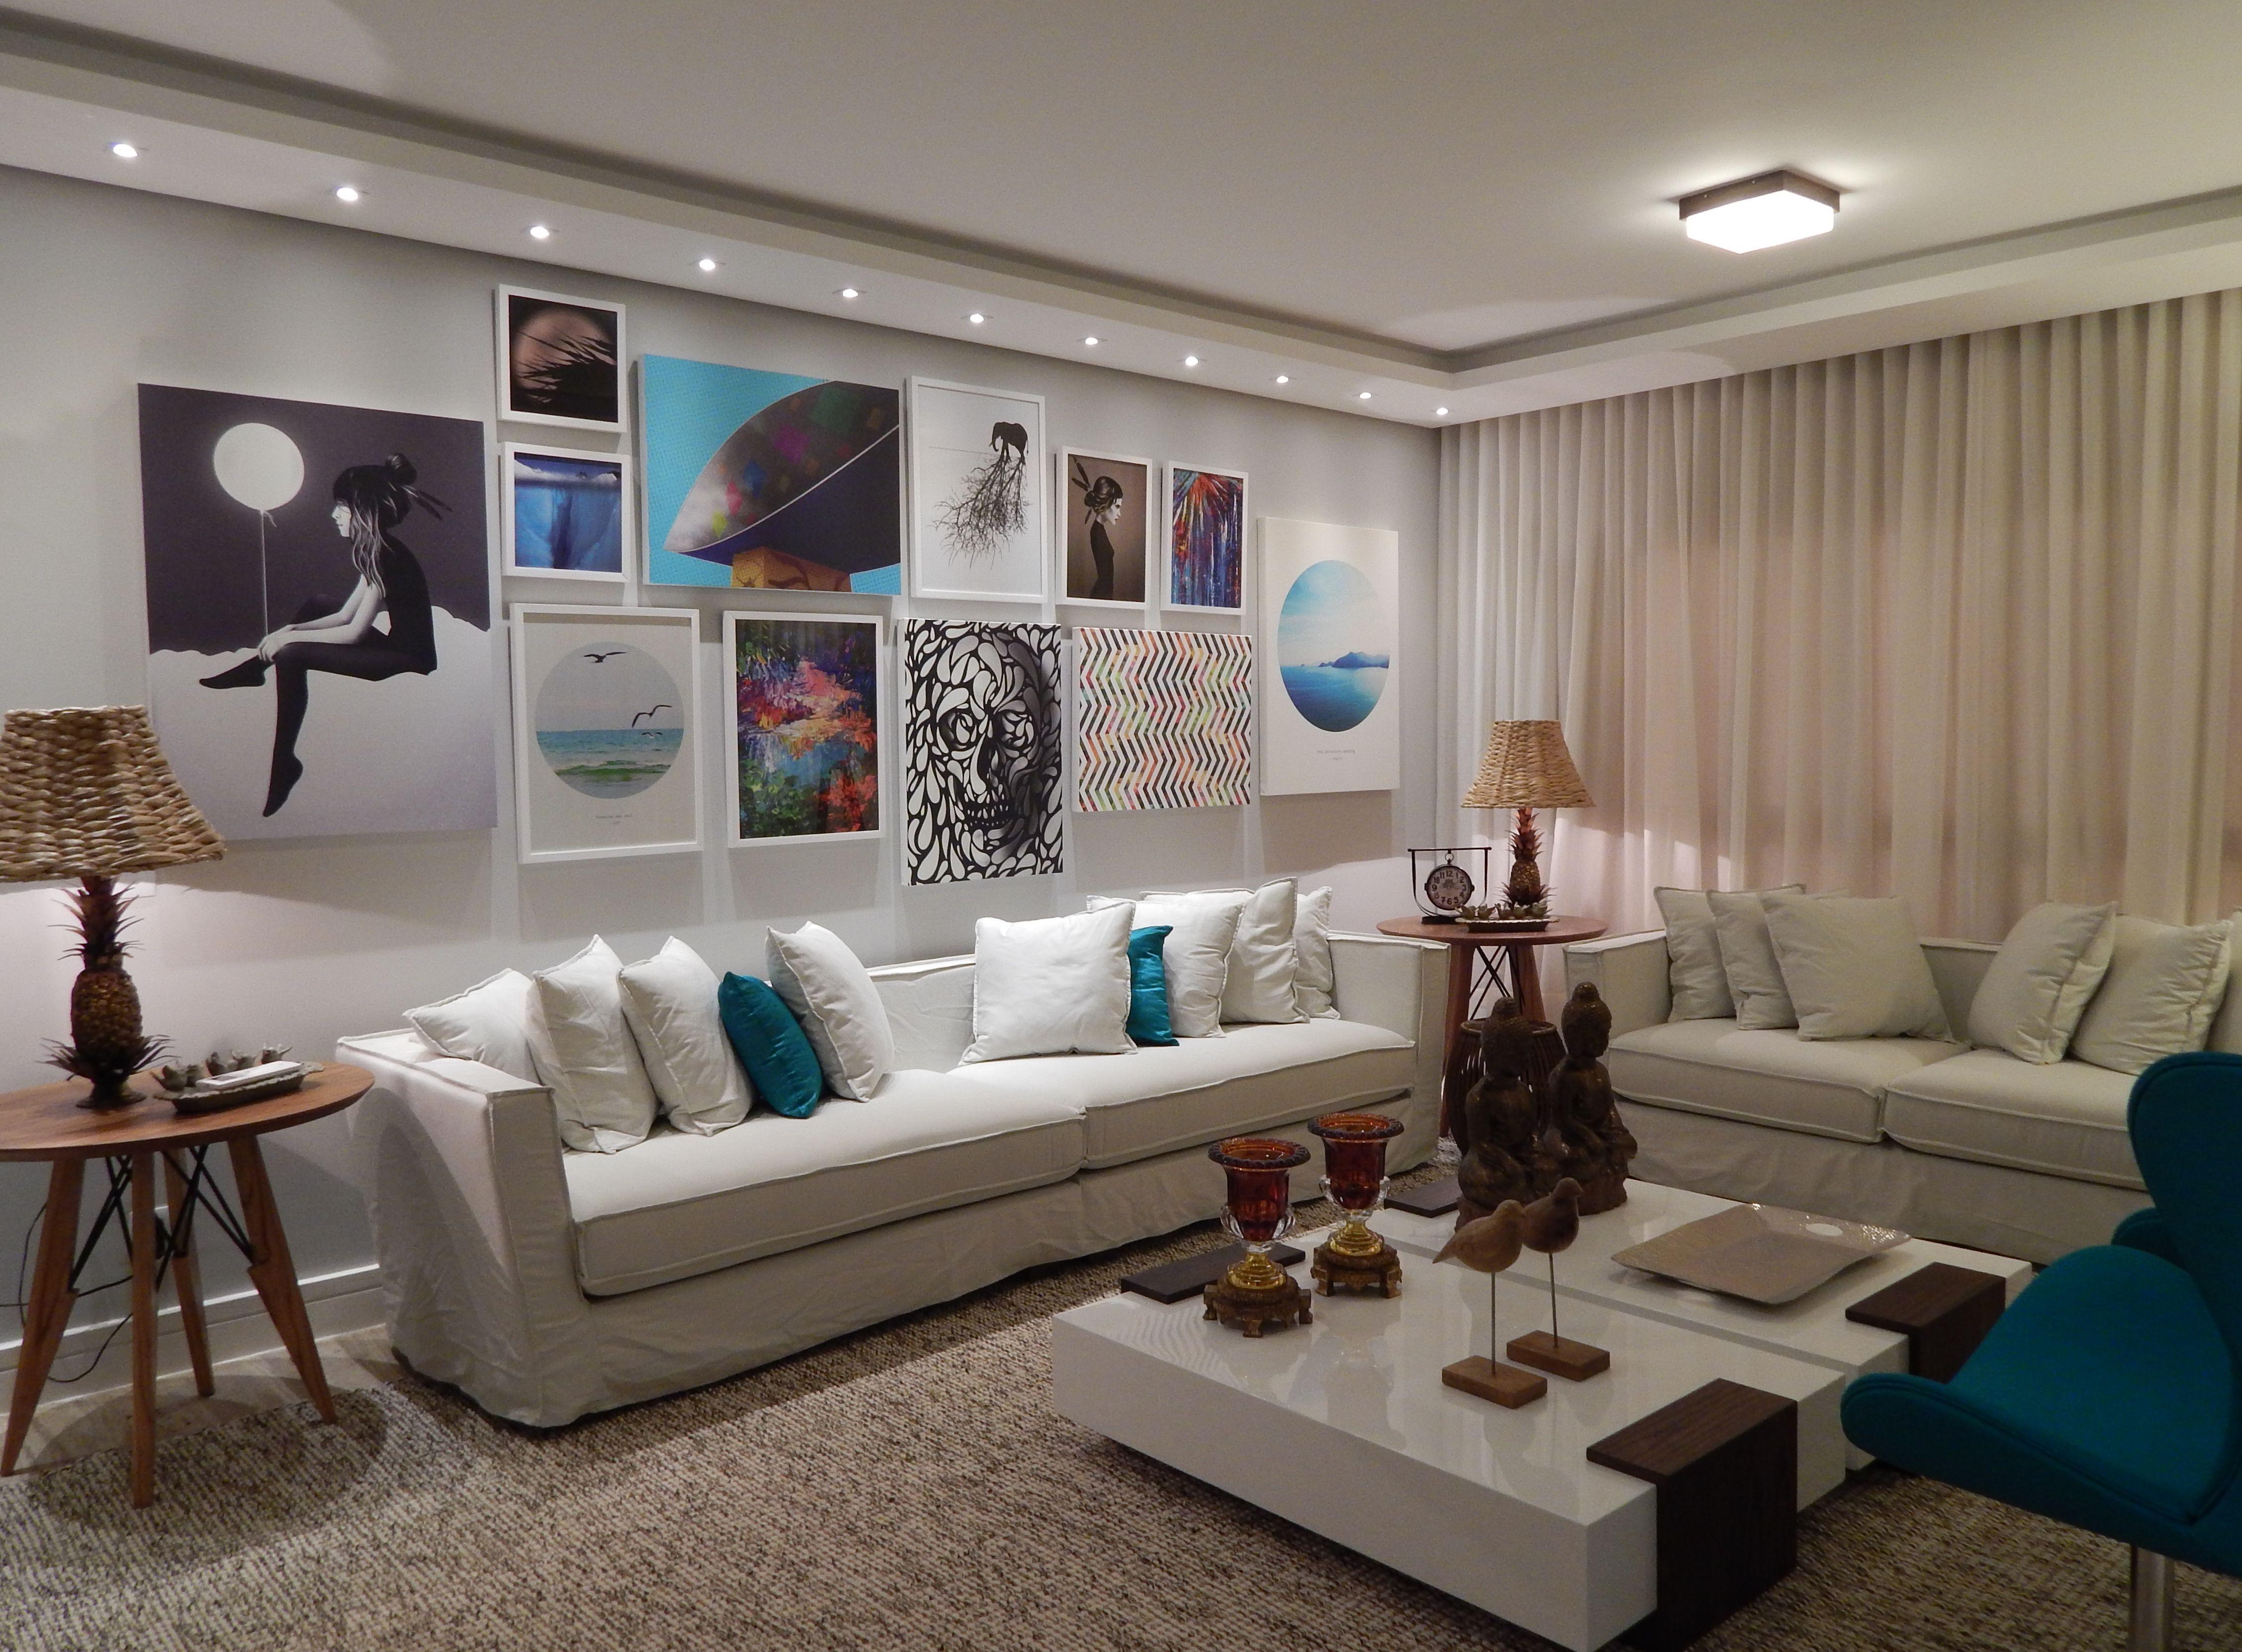 Sala de estar 2014 arquiteta barbara panassi azul - Sofa azul turquesa ...